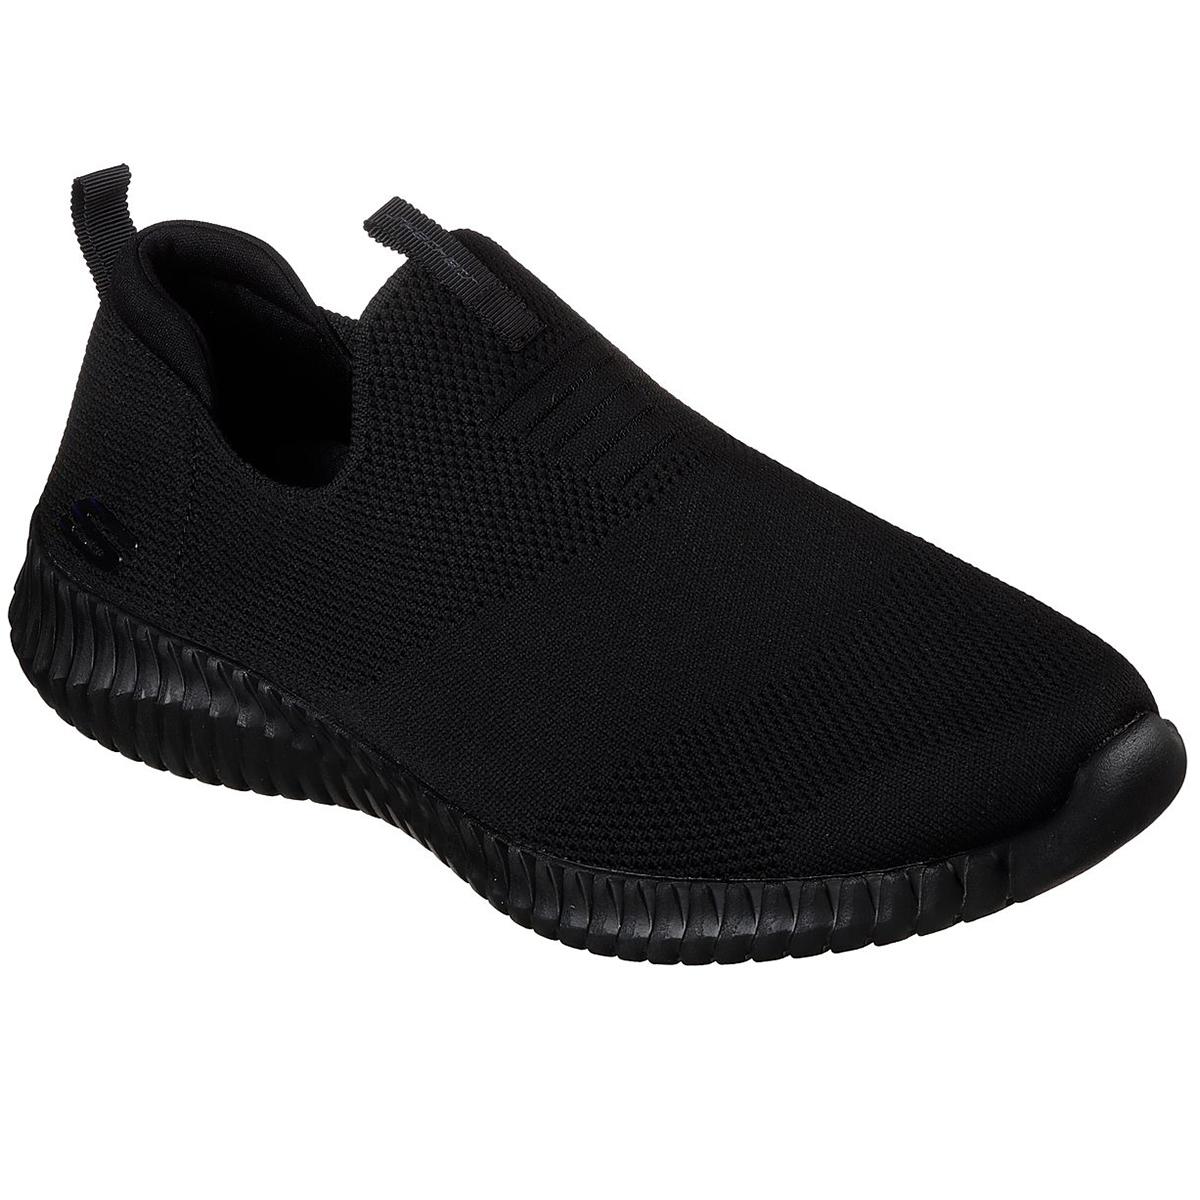 Skechers Men's Elite Flex Wasick Shoes - Black, 10